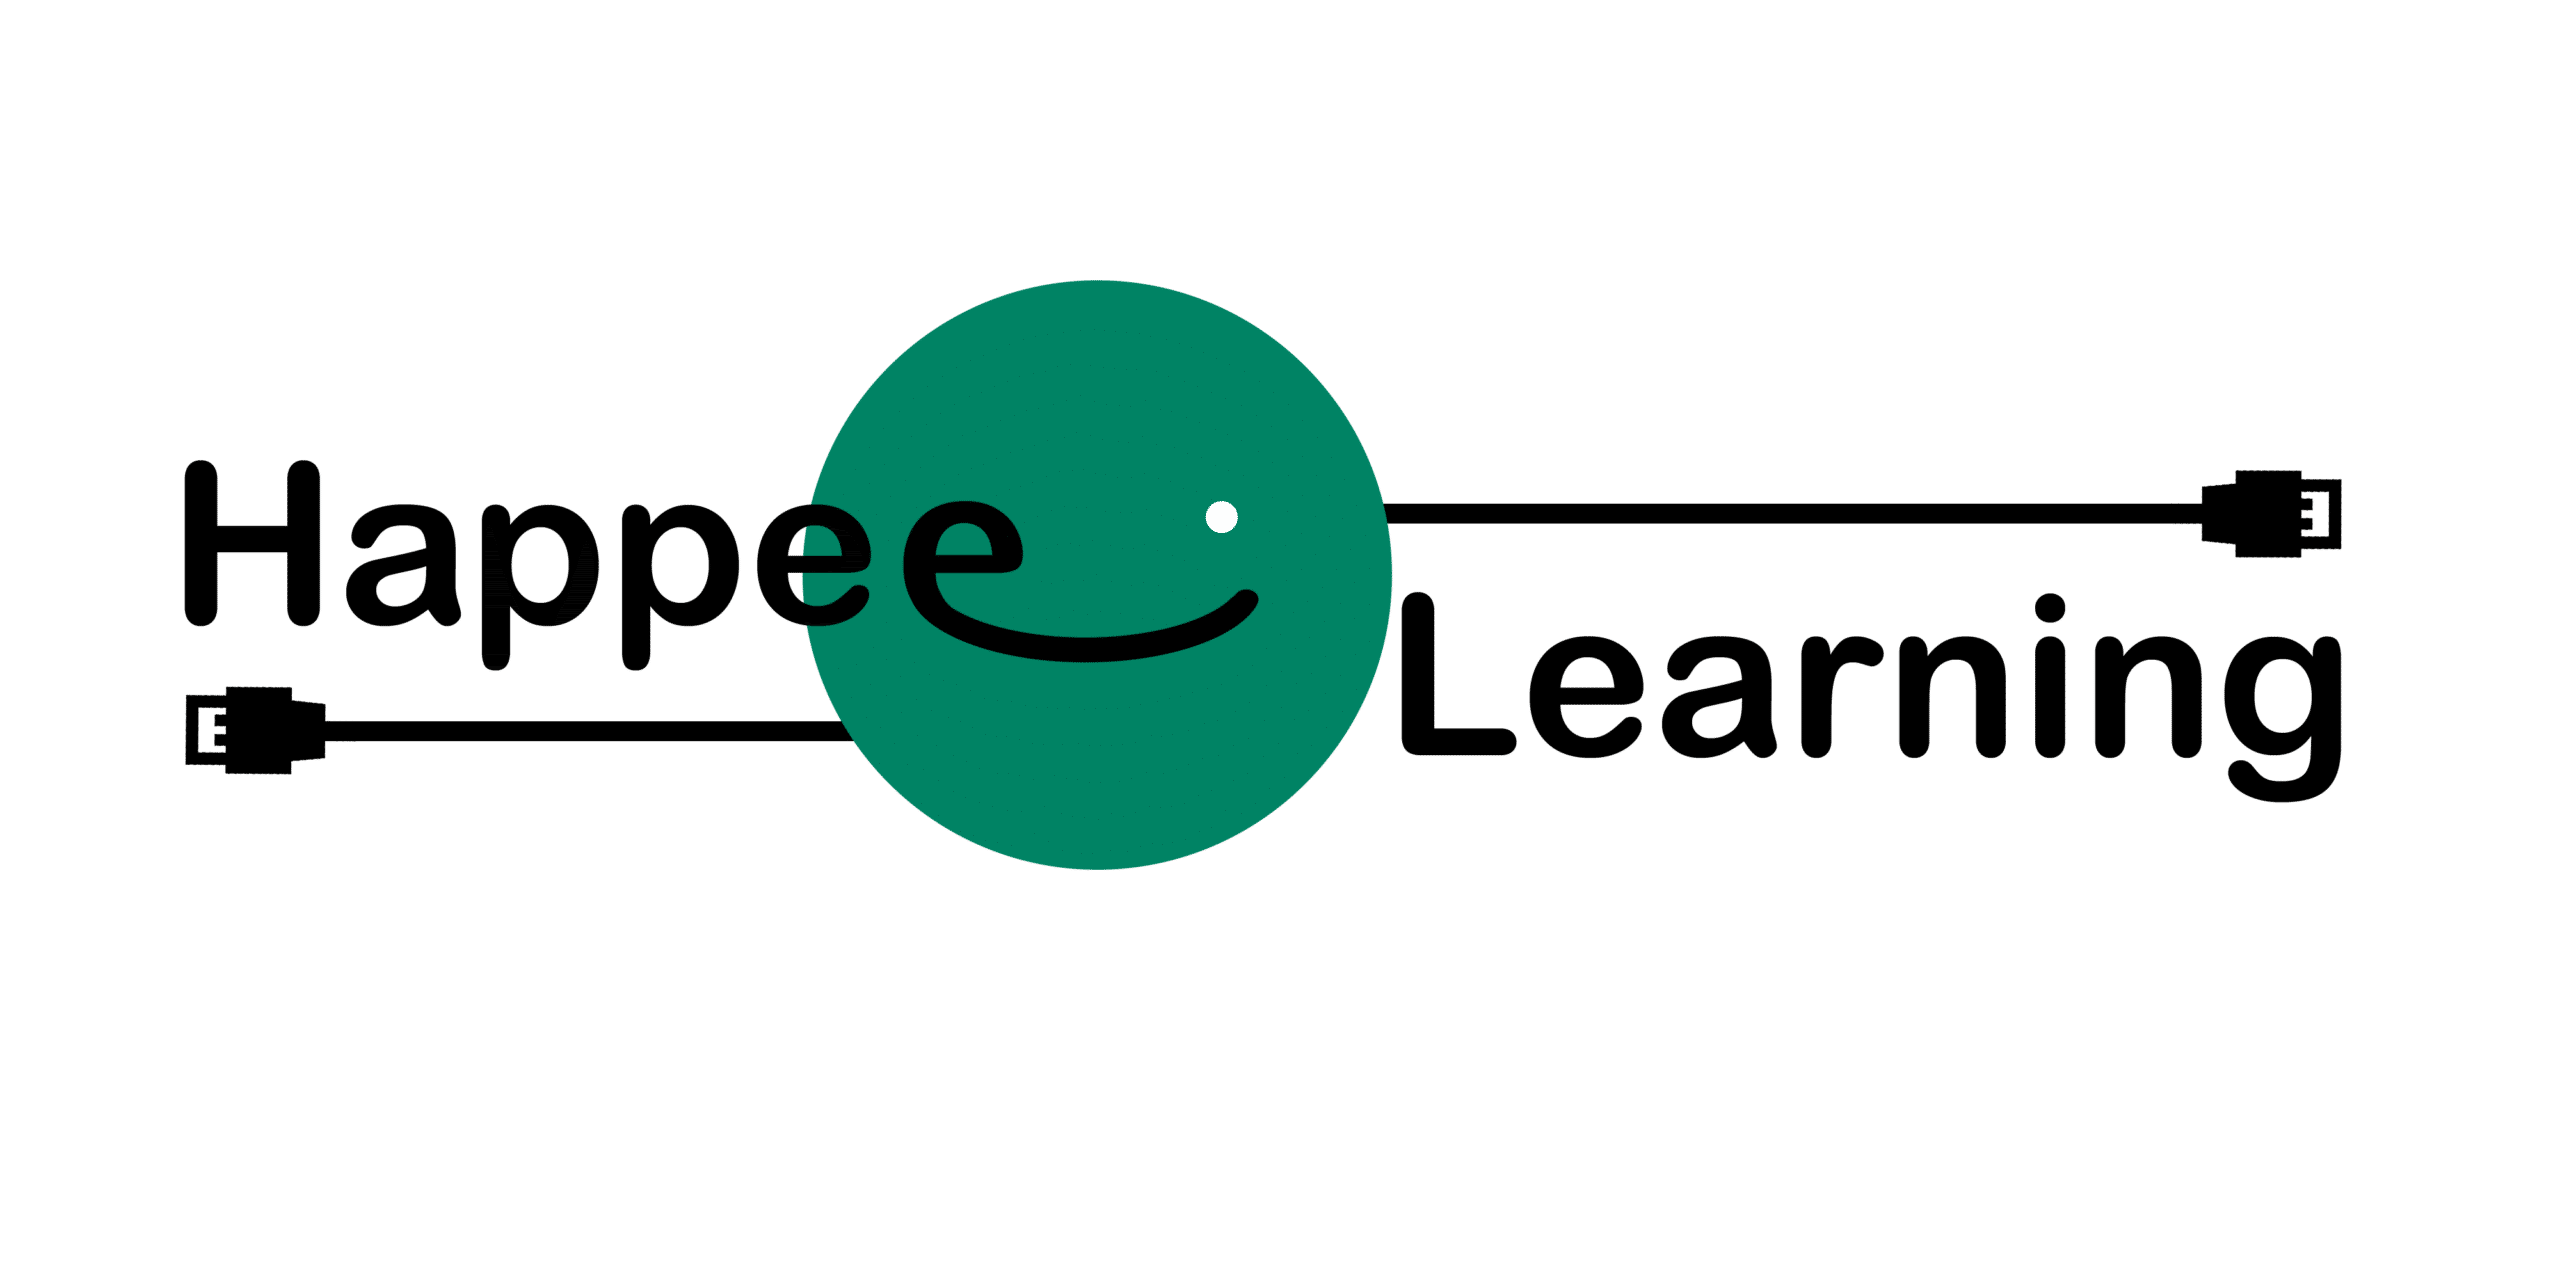 Happee Learning